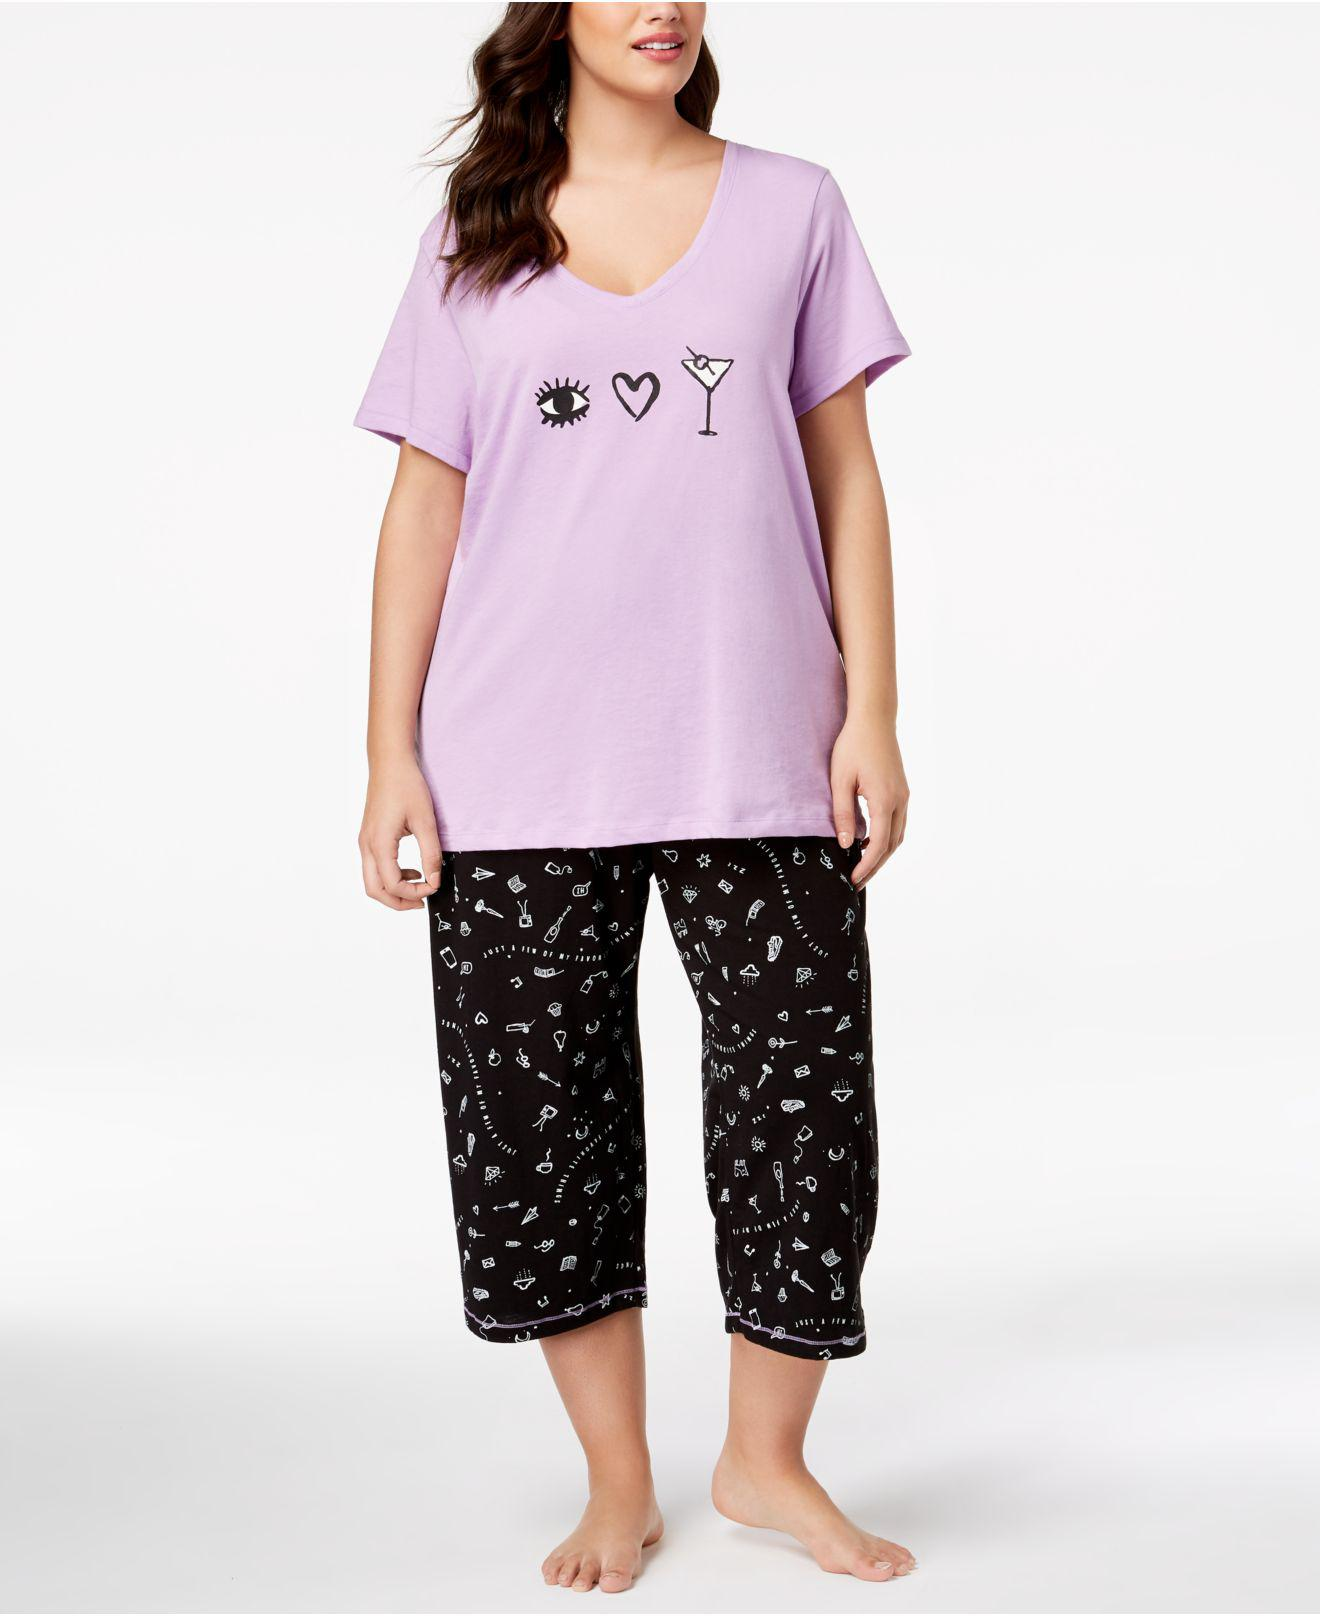 60a8f7d96d5 Lyst - Hue ® Plus Size Printed Capri Pajama Set